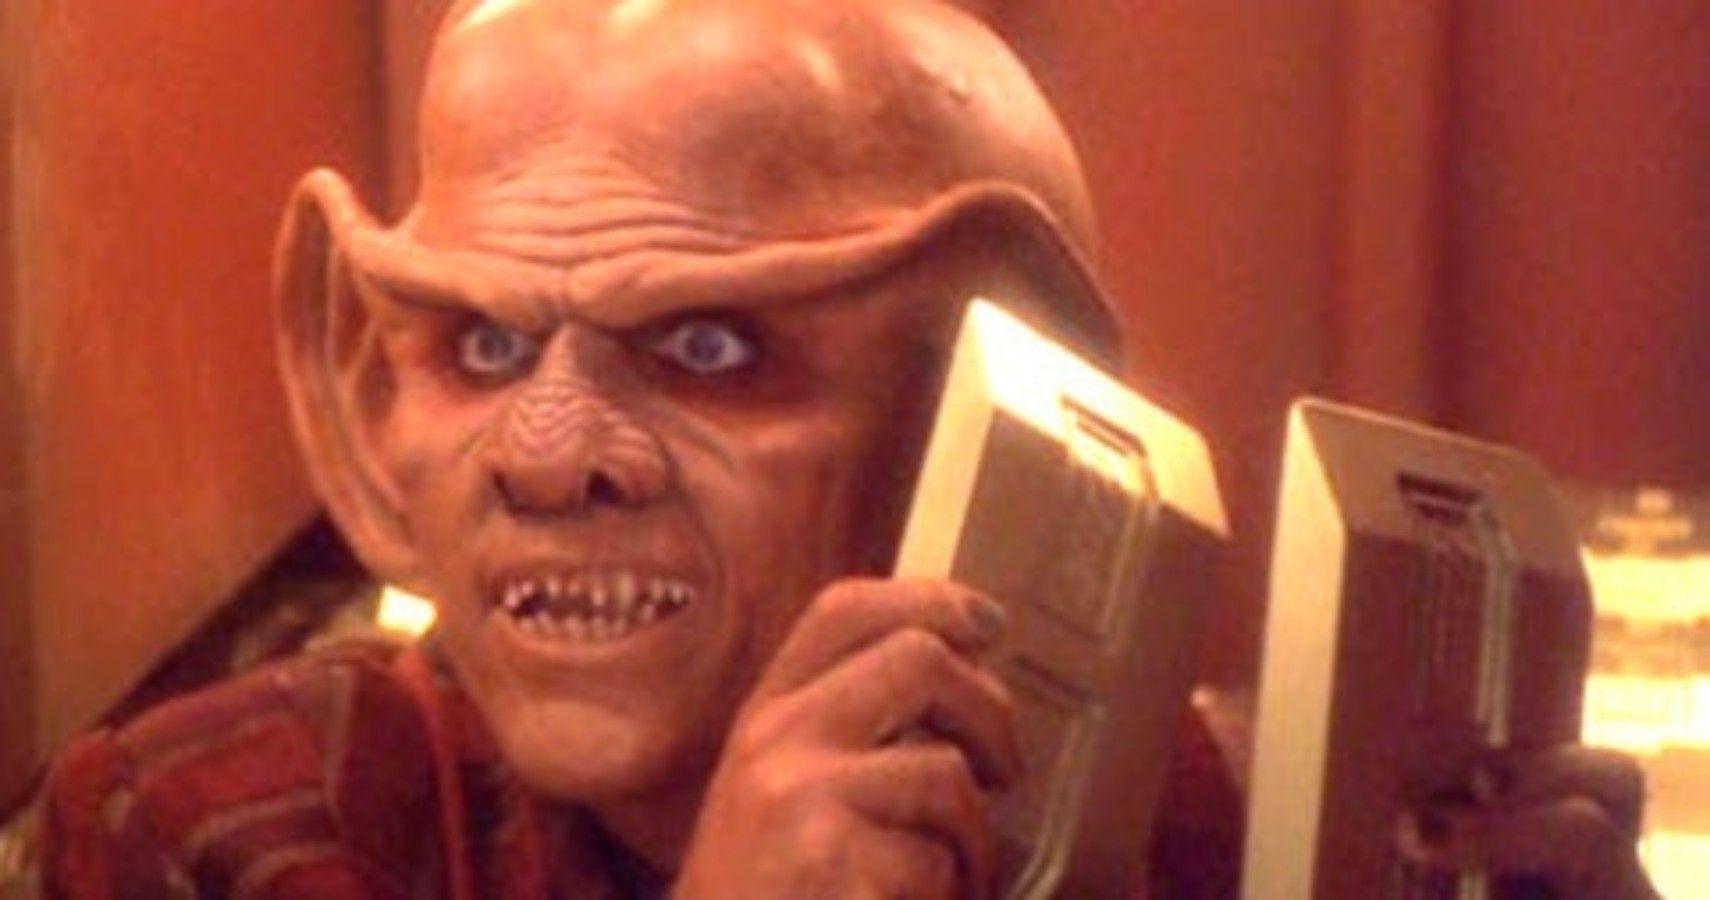 10 Hilarious Ways Star Trek's Economy Makes No Sense | ScreenRant